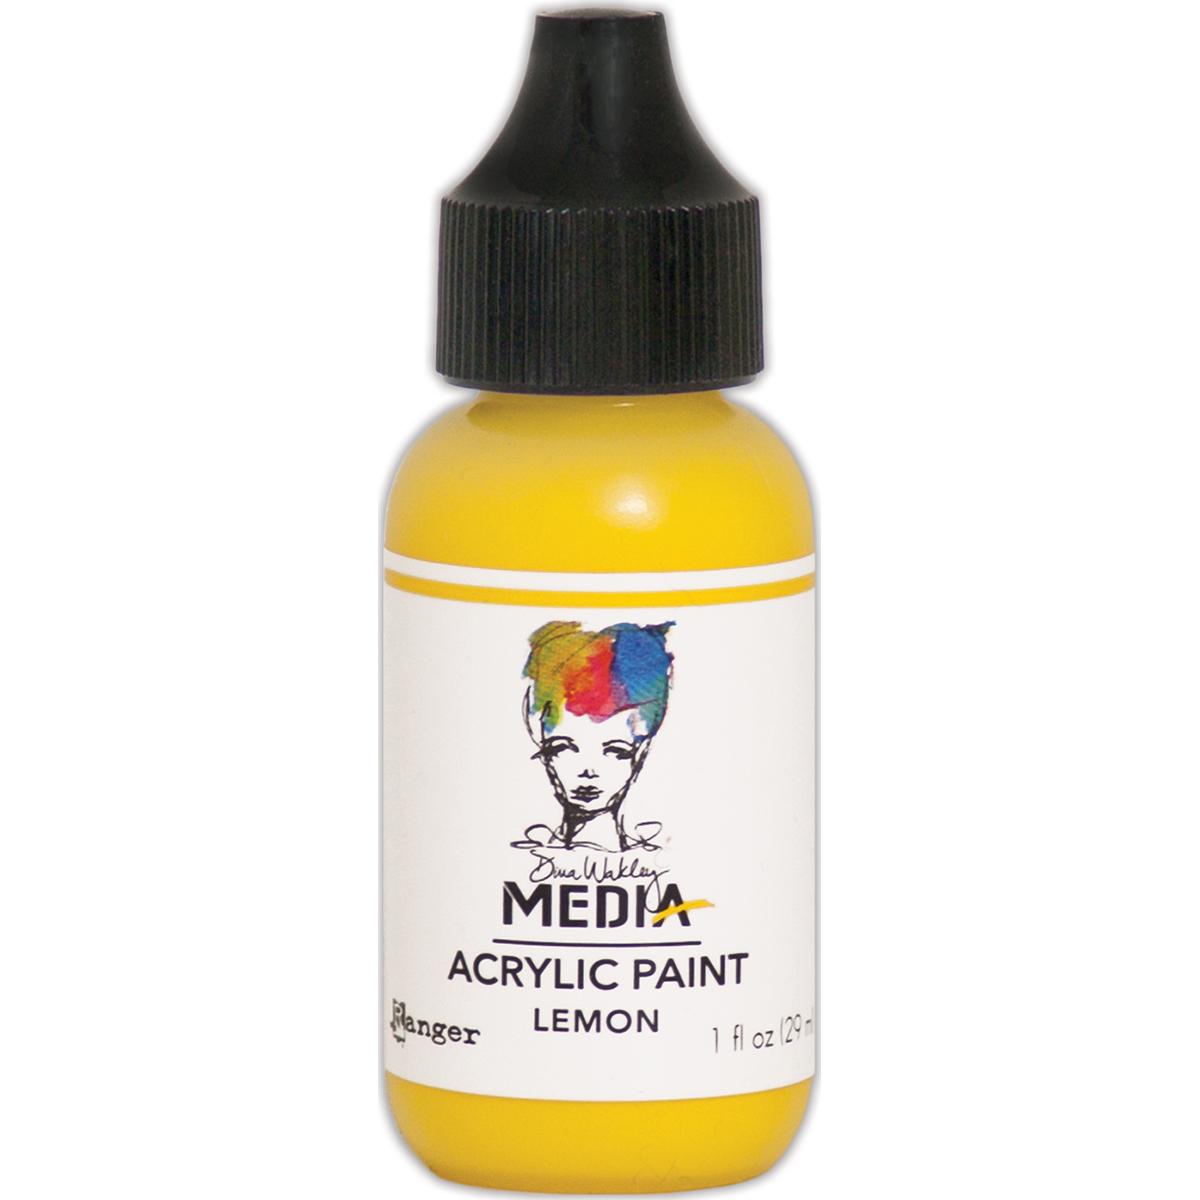 Dina Wakley Media Acrylic Paint 1oz-Lemon